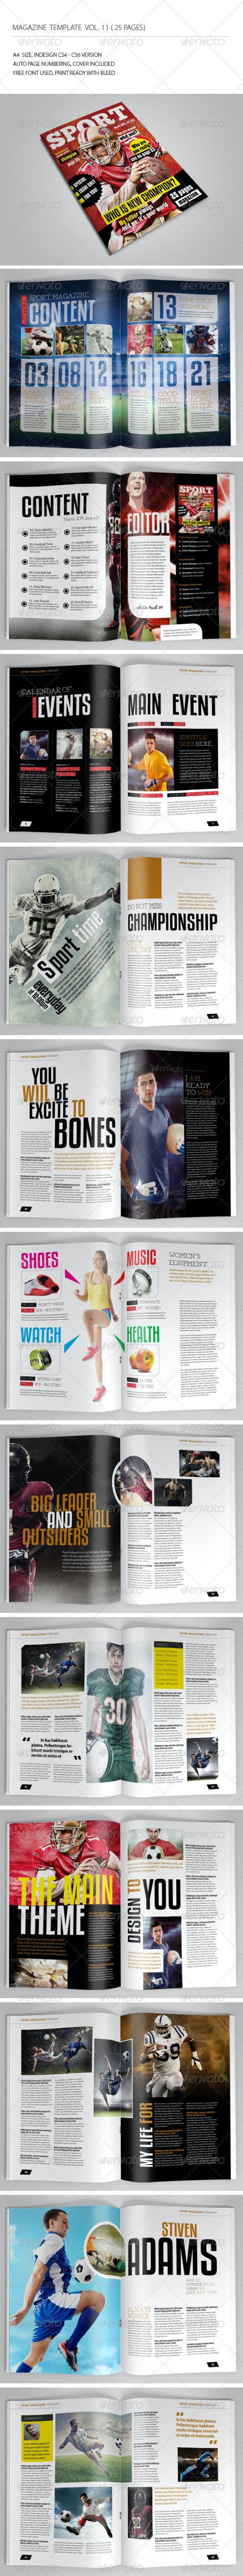 25 Pages Sport Magazine Vol11 - Magazines Print Templates